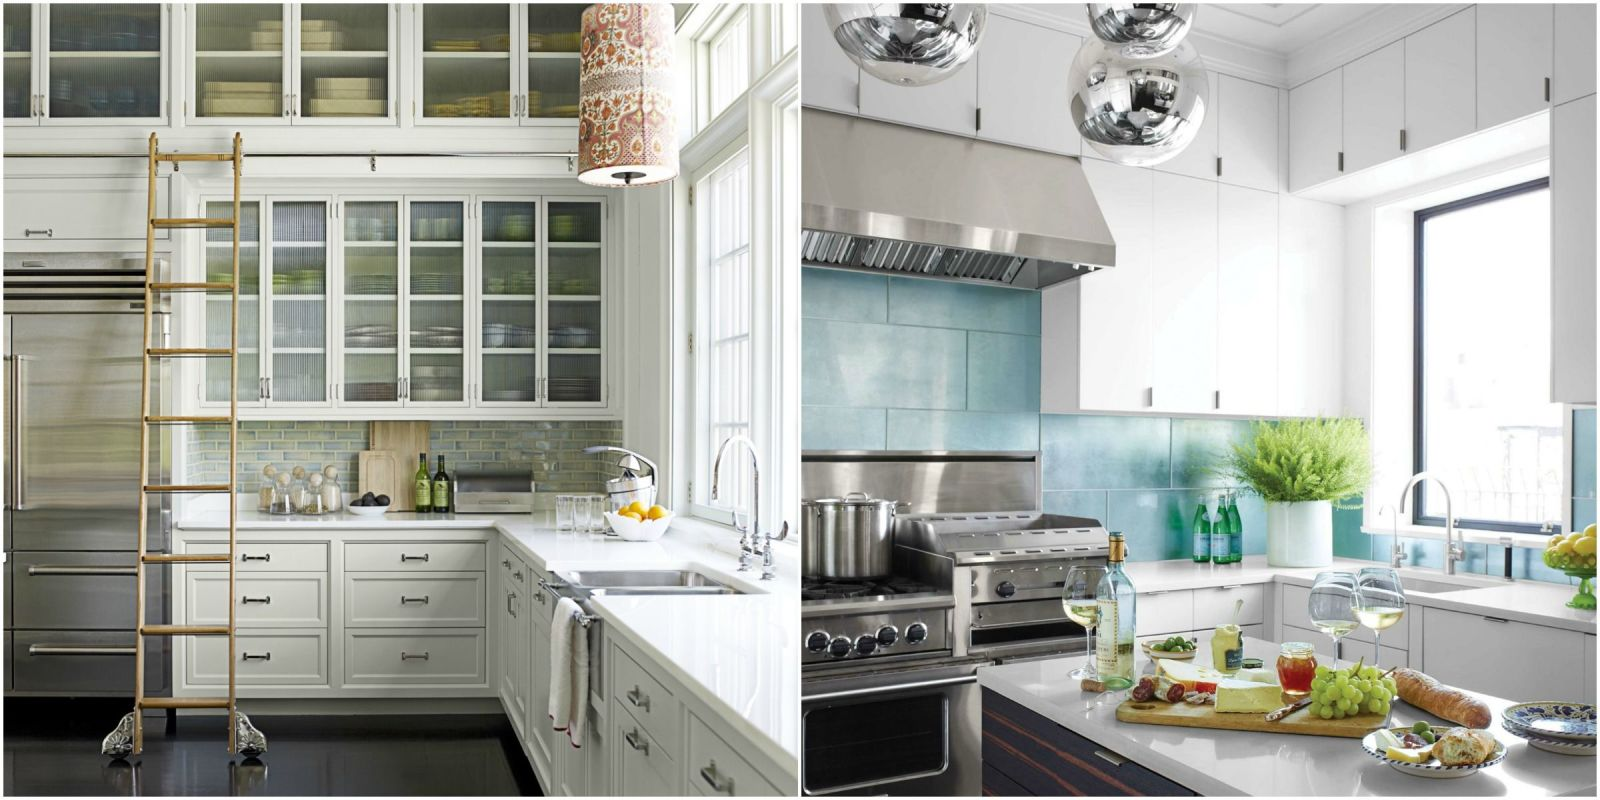 stylish ways to add kitchen style kitchen interior design ideas stylish ways to add kitchen style kitchen interior design ideas that add organization